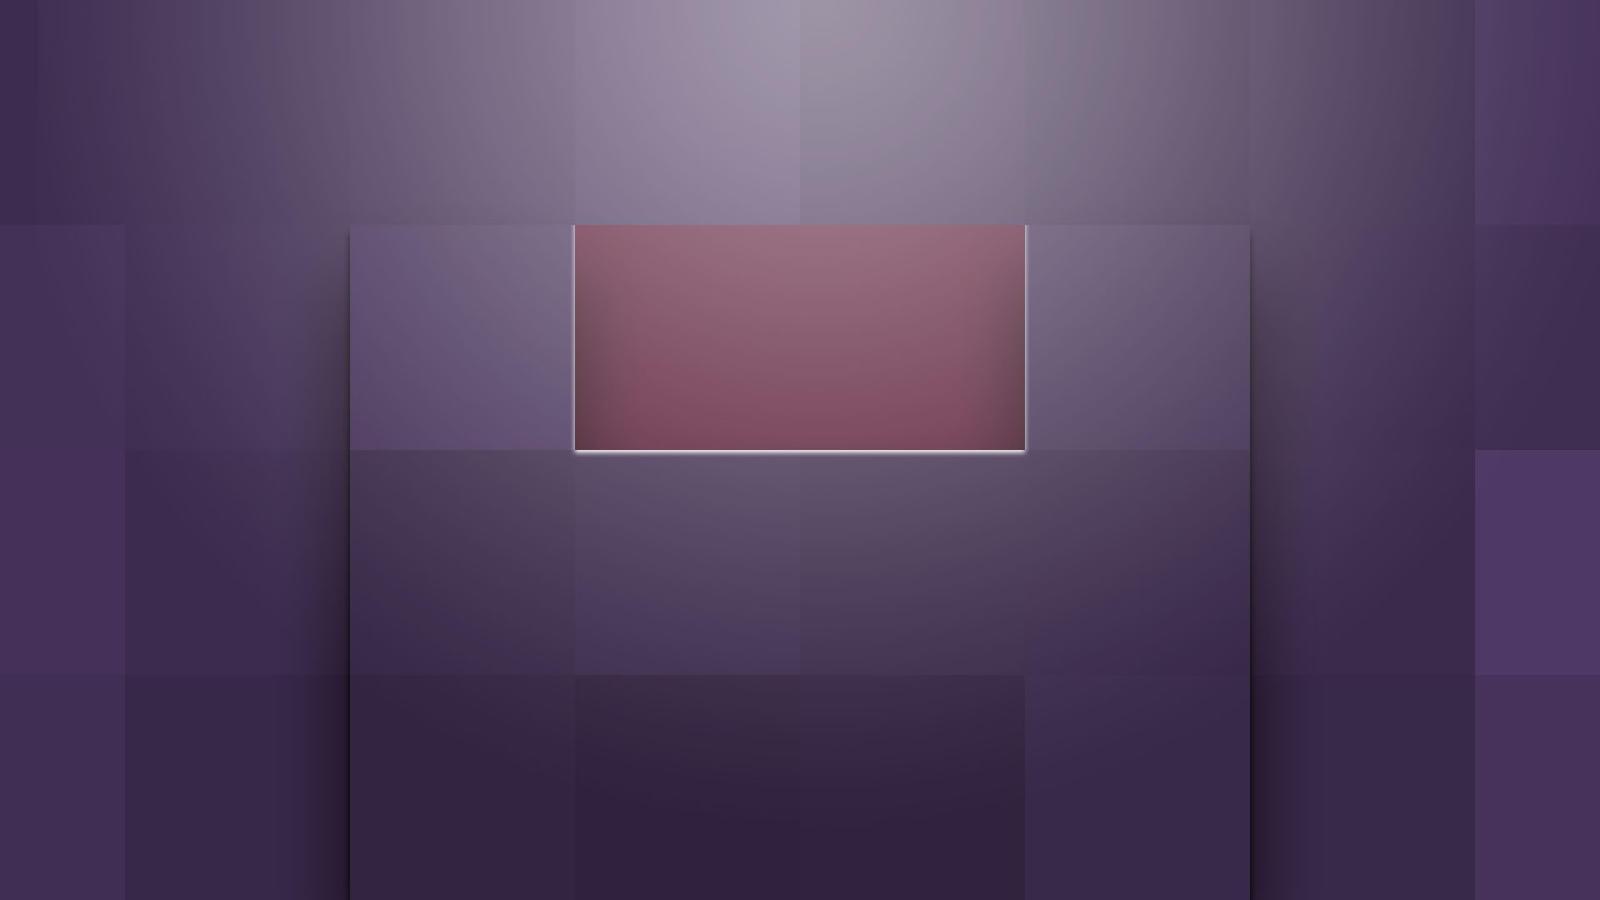 Good Wallpaper Minecraft Square - minecraft_wallpaper__endermite_by_halo4guest-d8axac8  2018_96381.jpg